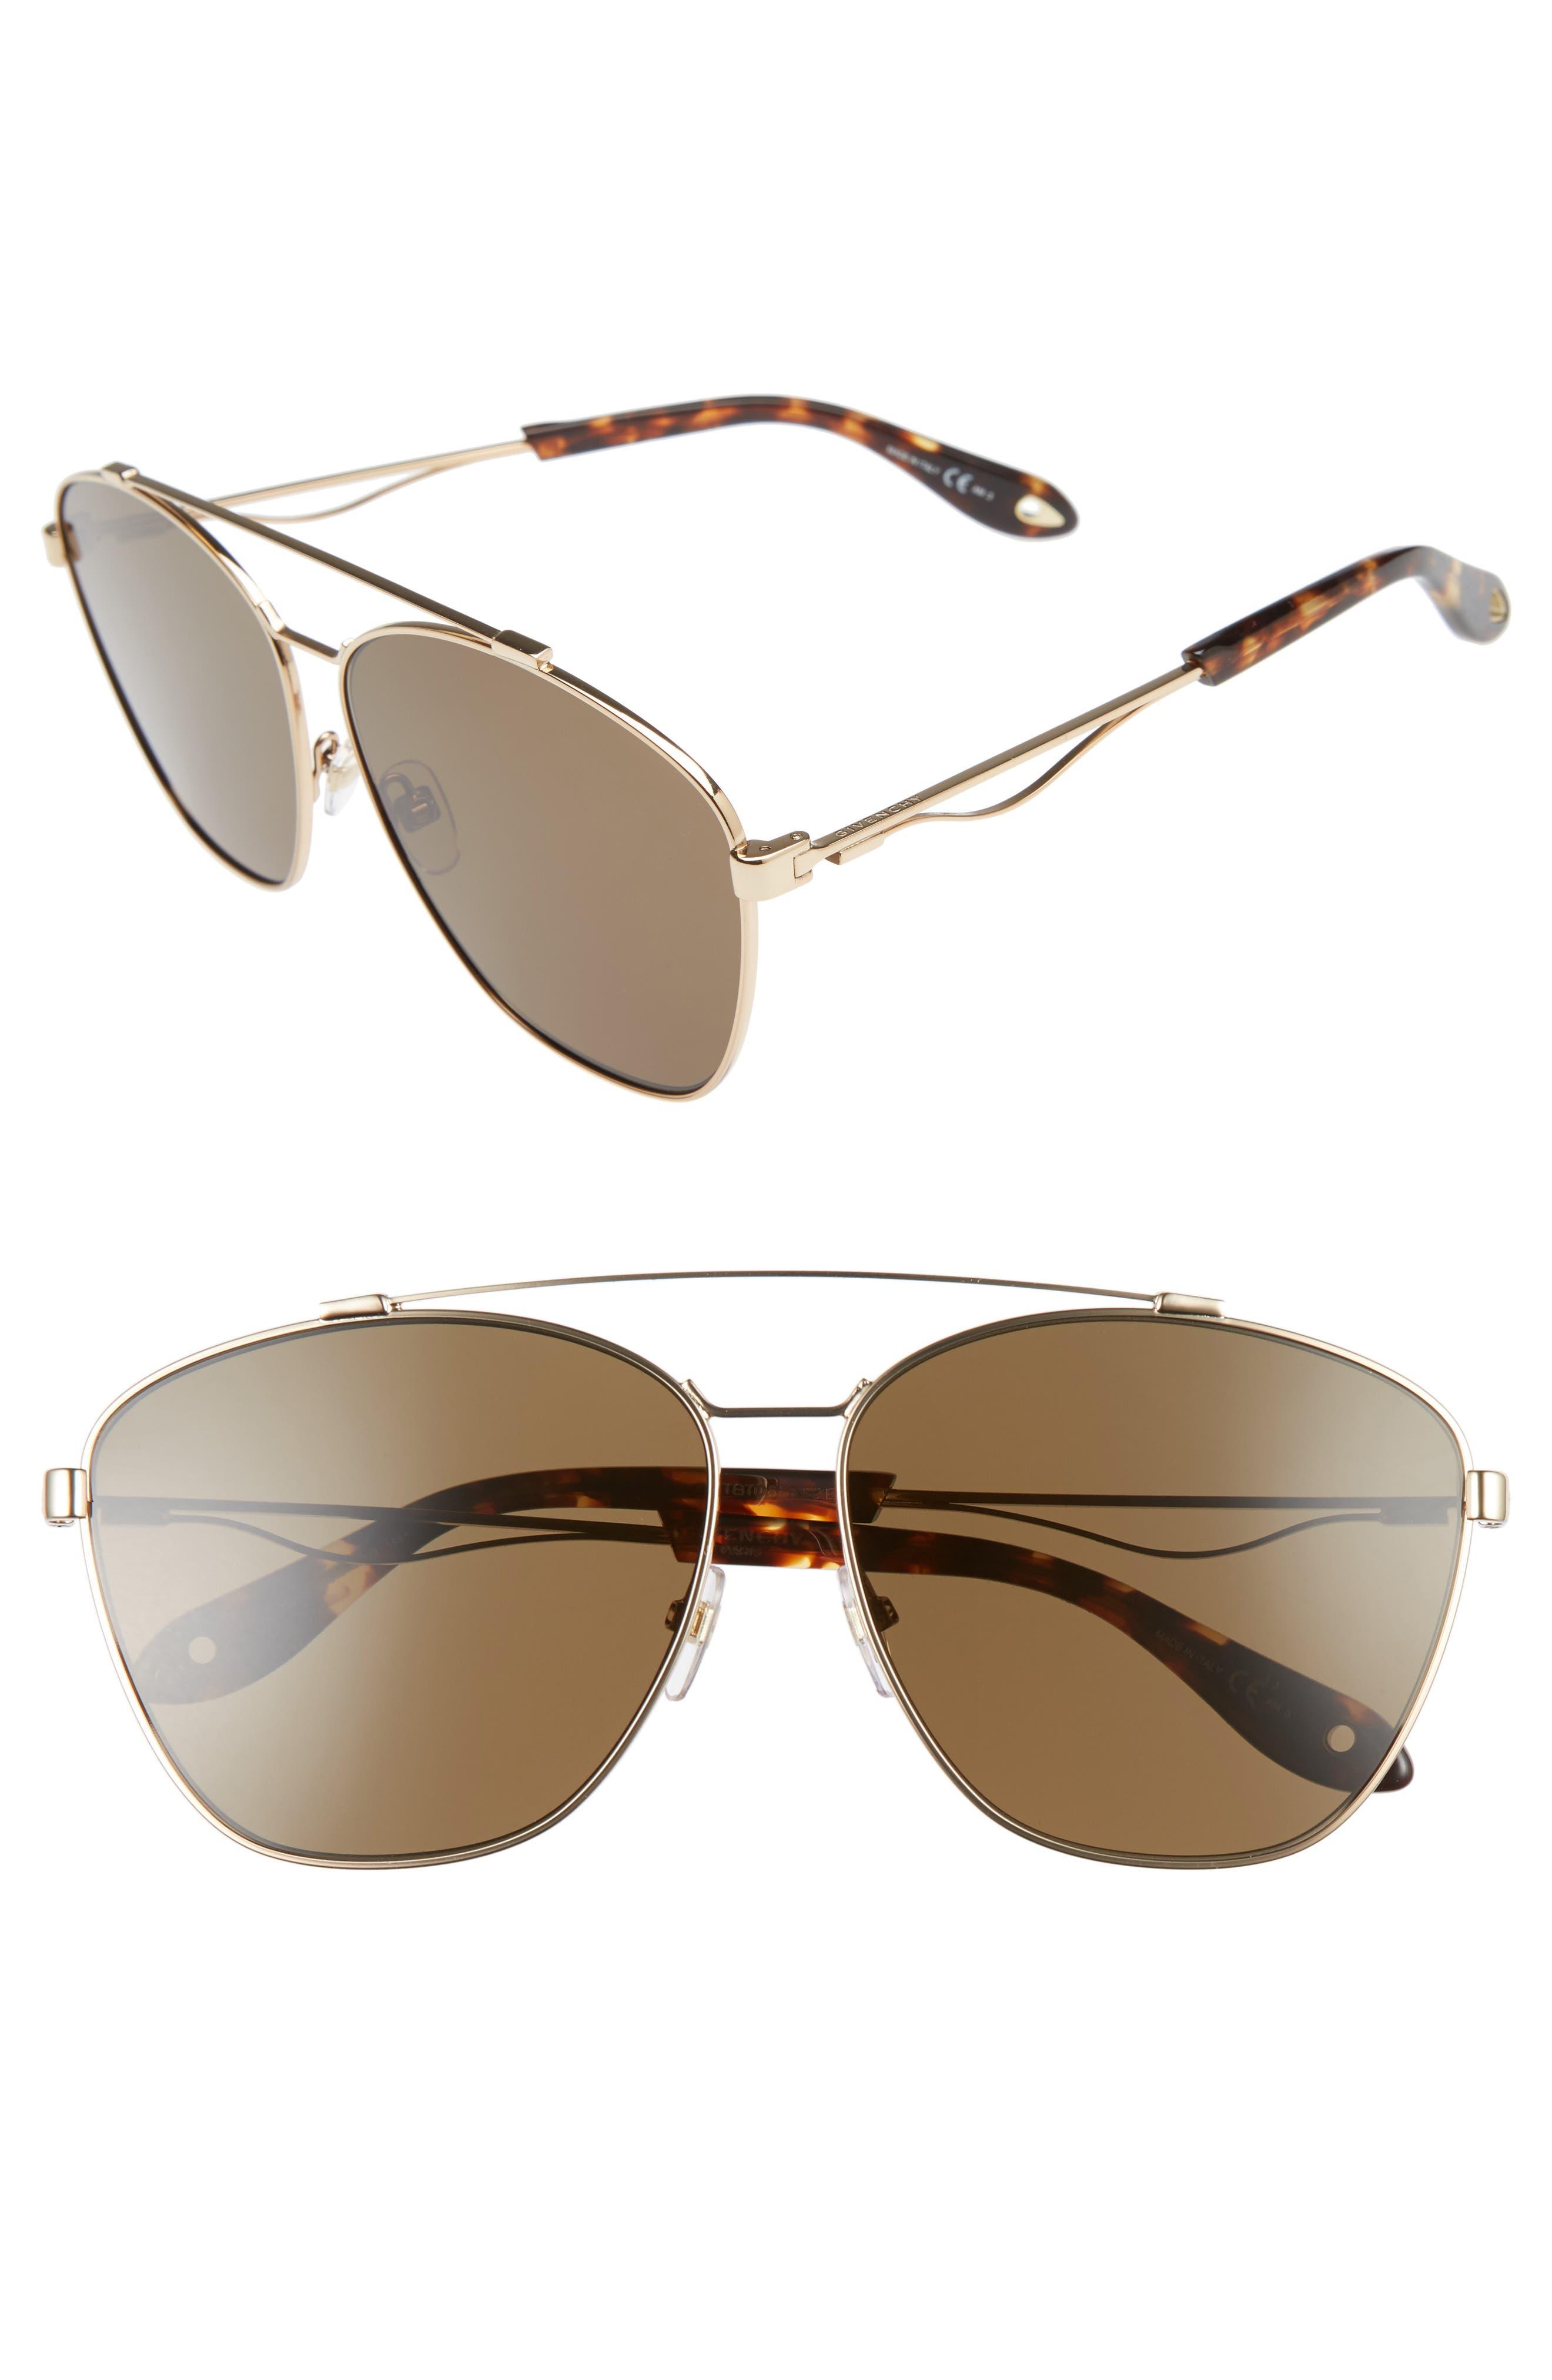 Givenchy 65mm Navigator Sunglasses